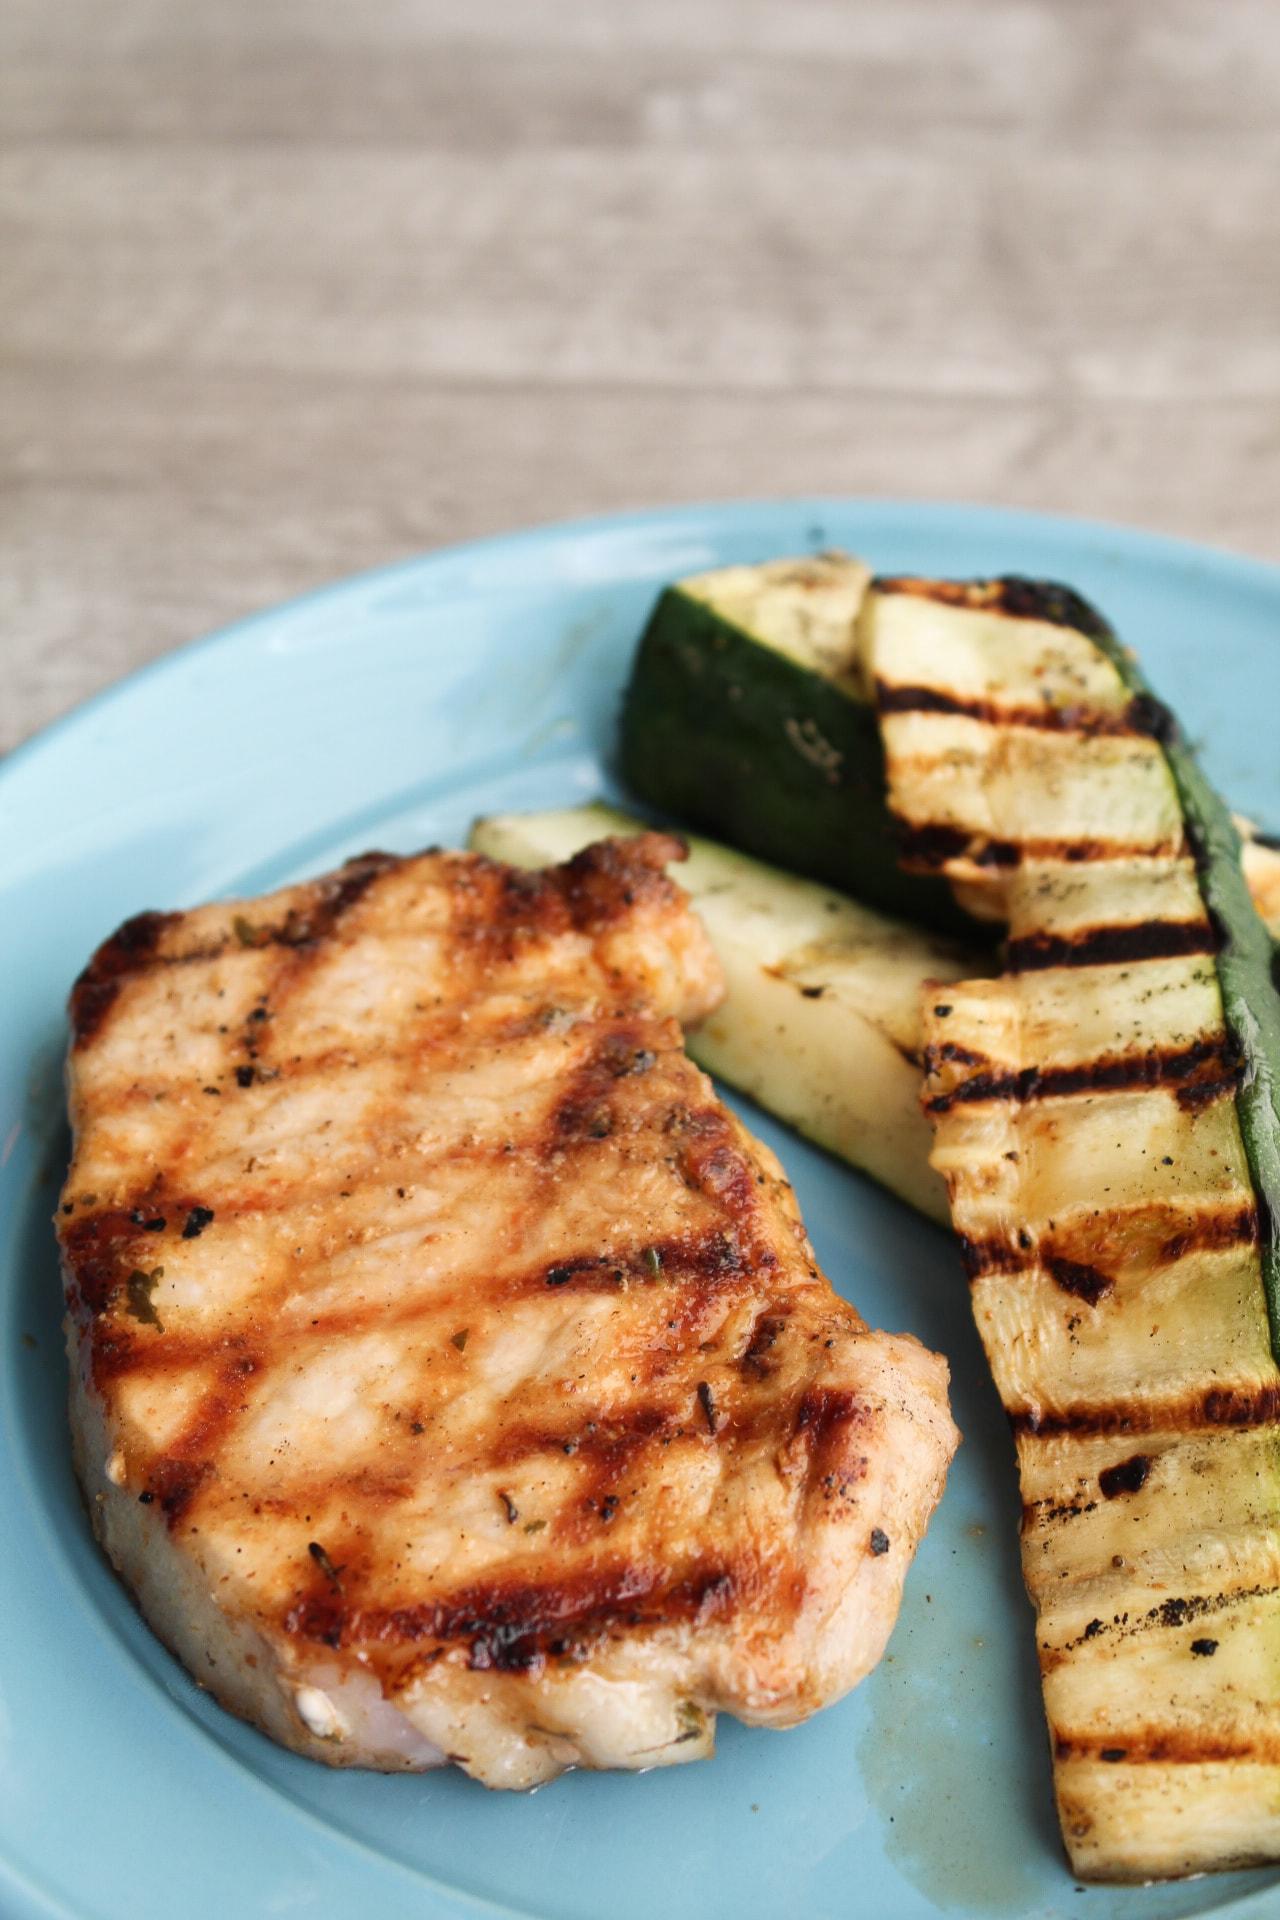 keto pork chop recipe grill Easy Keto Grilled Pork Chops Marinade - Fit Mom Journey